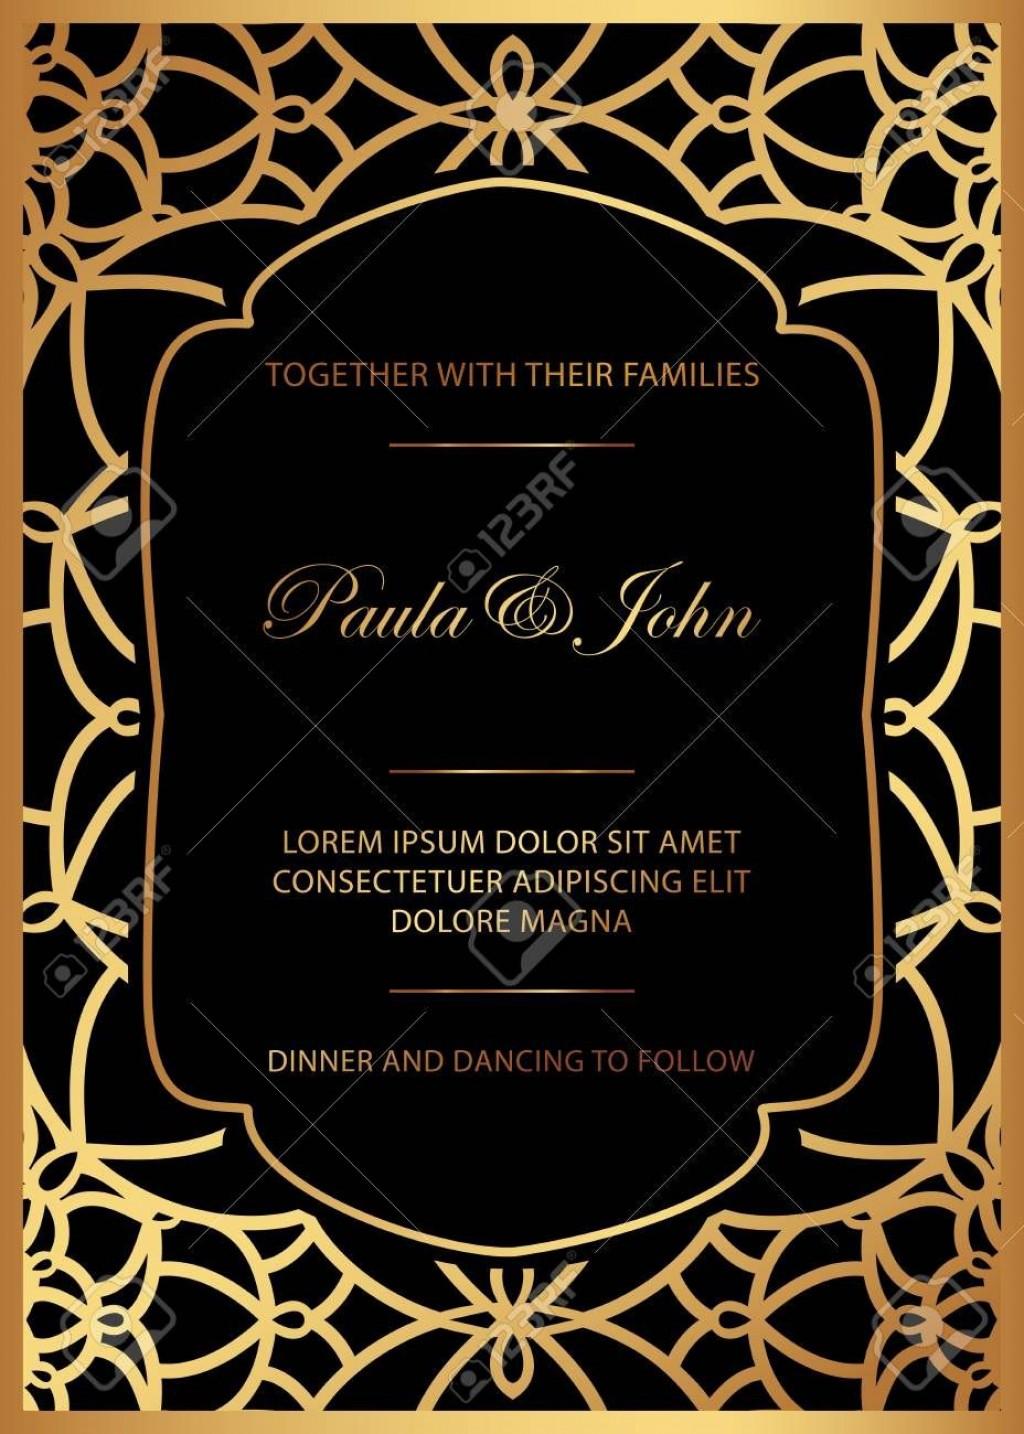 006 Breathtaking Black And Gold Invitation Template Idea  Design White Free PrintableLarge